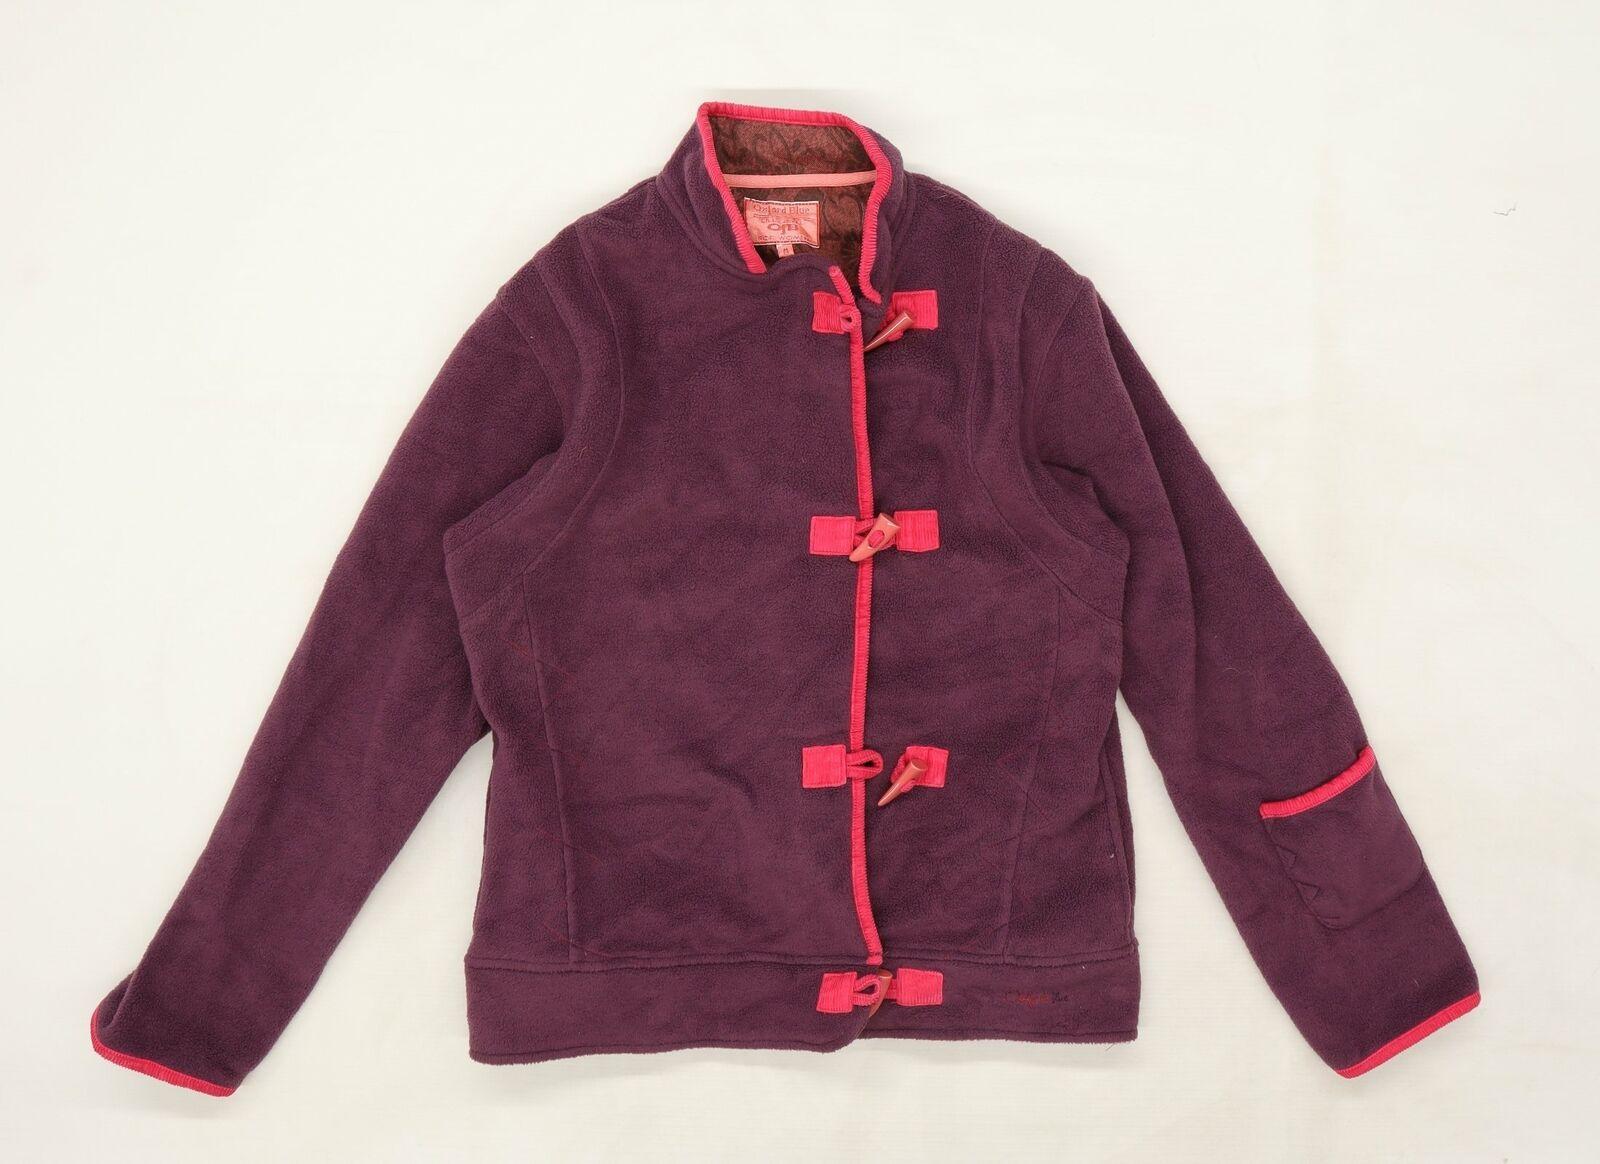 Oxford Blue Lifestyle Womens Purple Jacket Coat Size 14